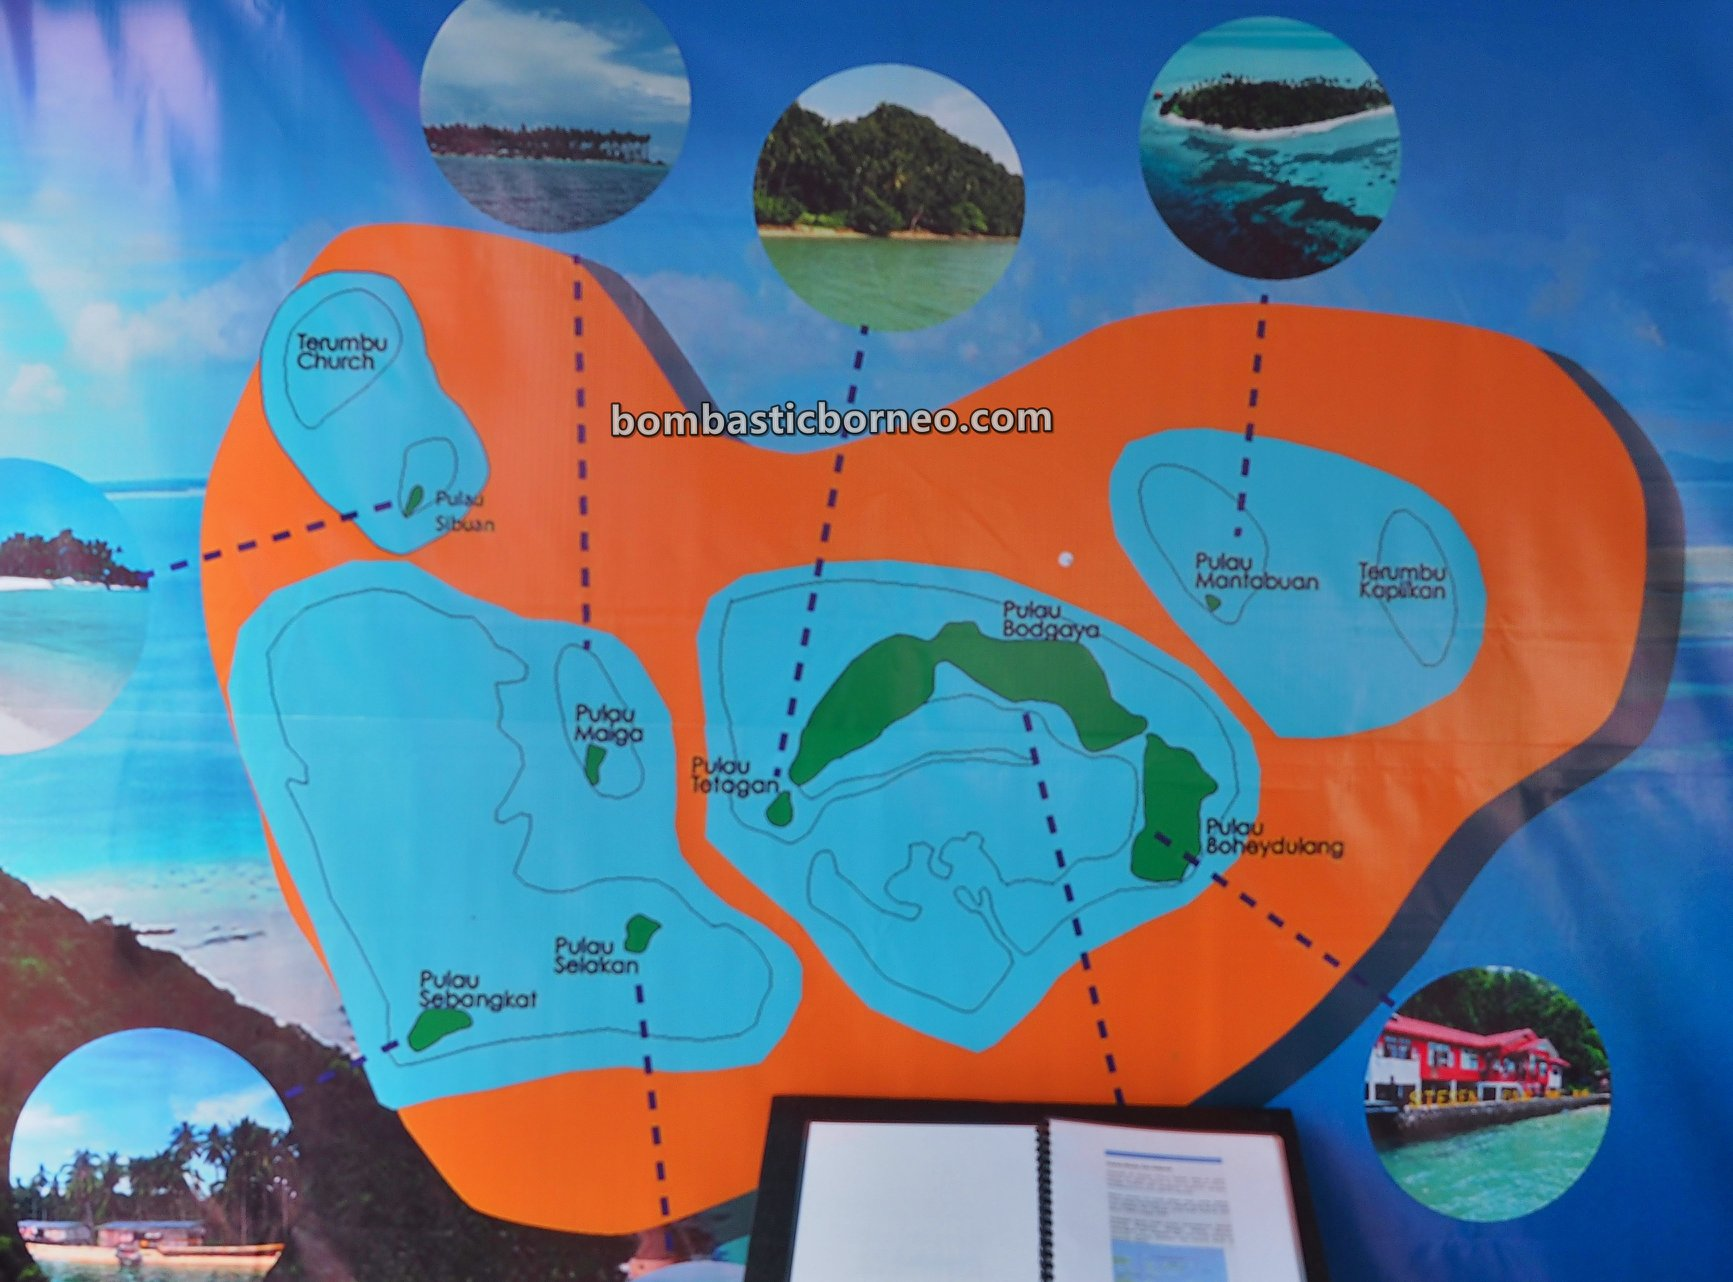 backpackers, Sea Gypsies, Suku Bajau Laut, nature, Tawau, Malaysia, Tourist attraction, travel guide, Borneo, 婆罗洲游踪, 马来西亚沙巴, 仙本那旅游景点,